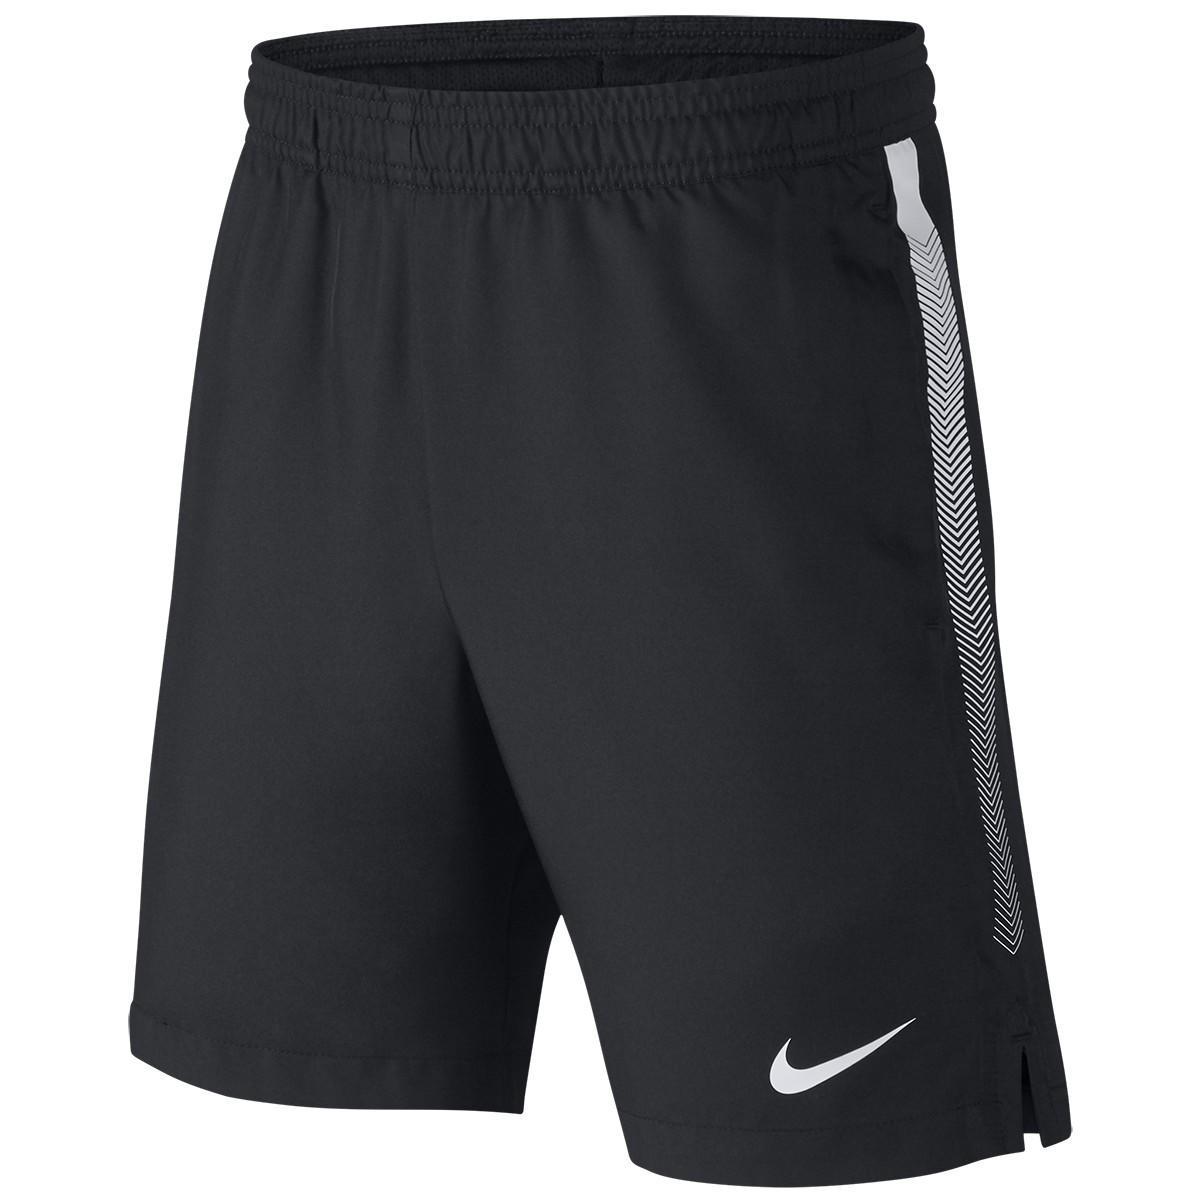 Теннисные шорты детские Nike Court Boys Dry Short black/white